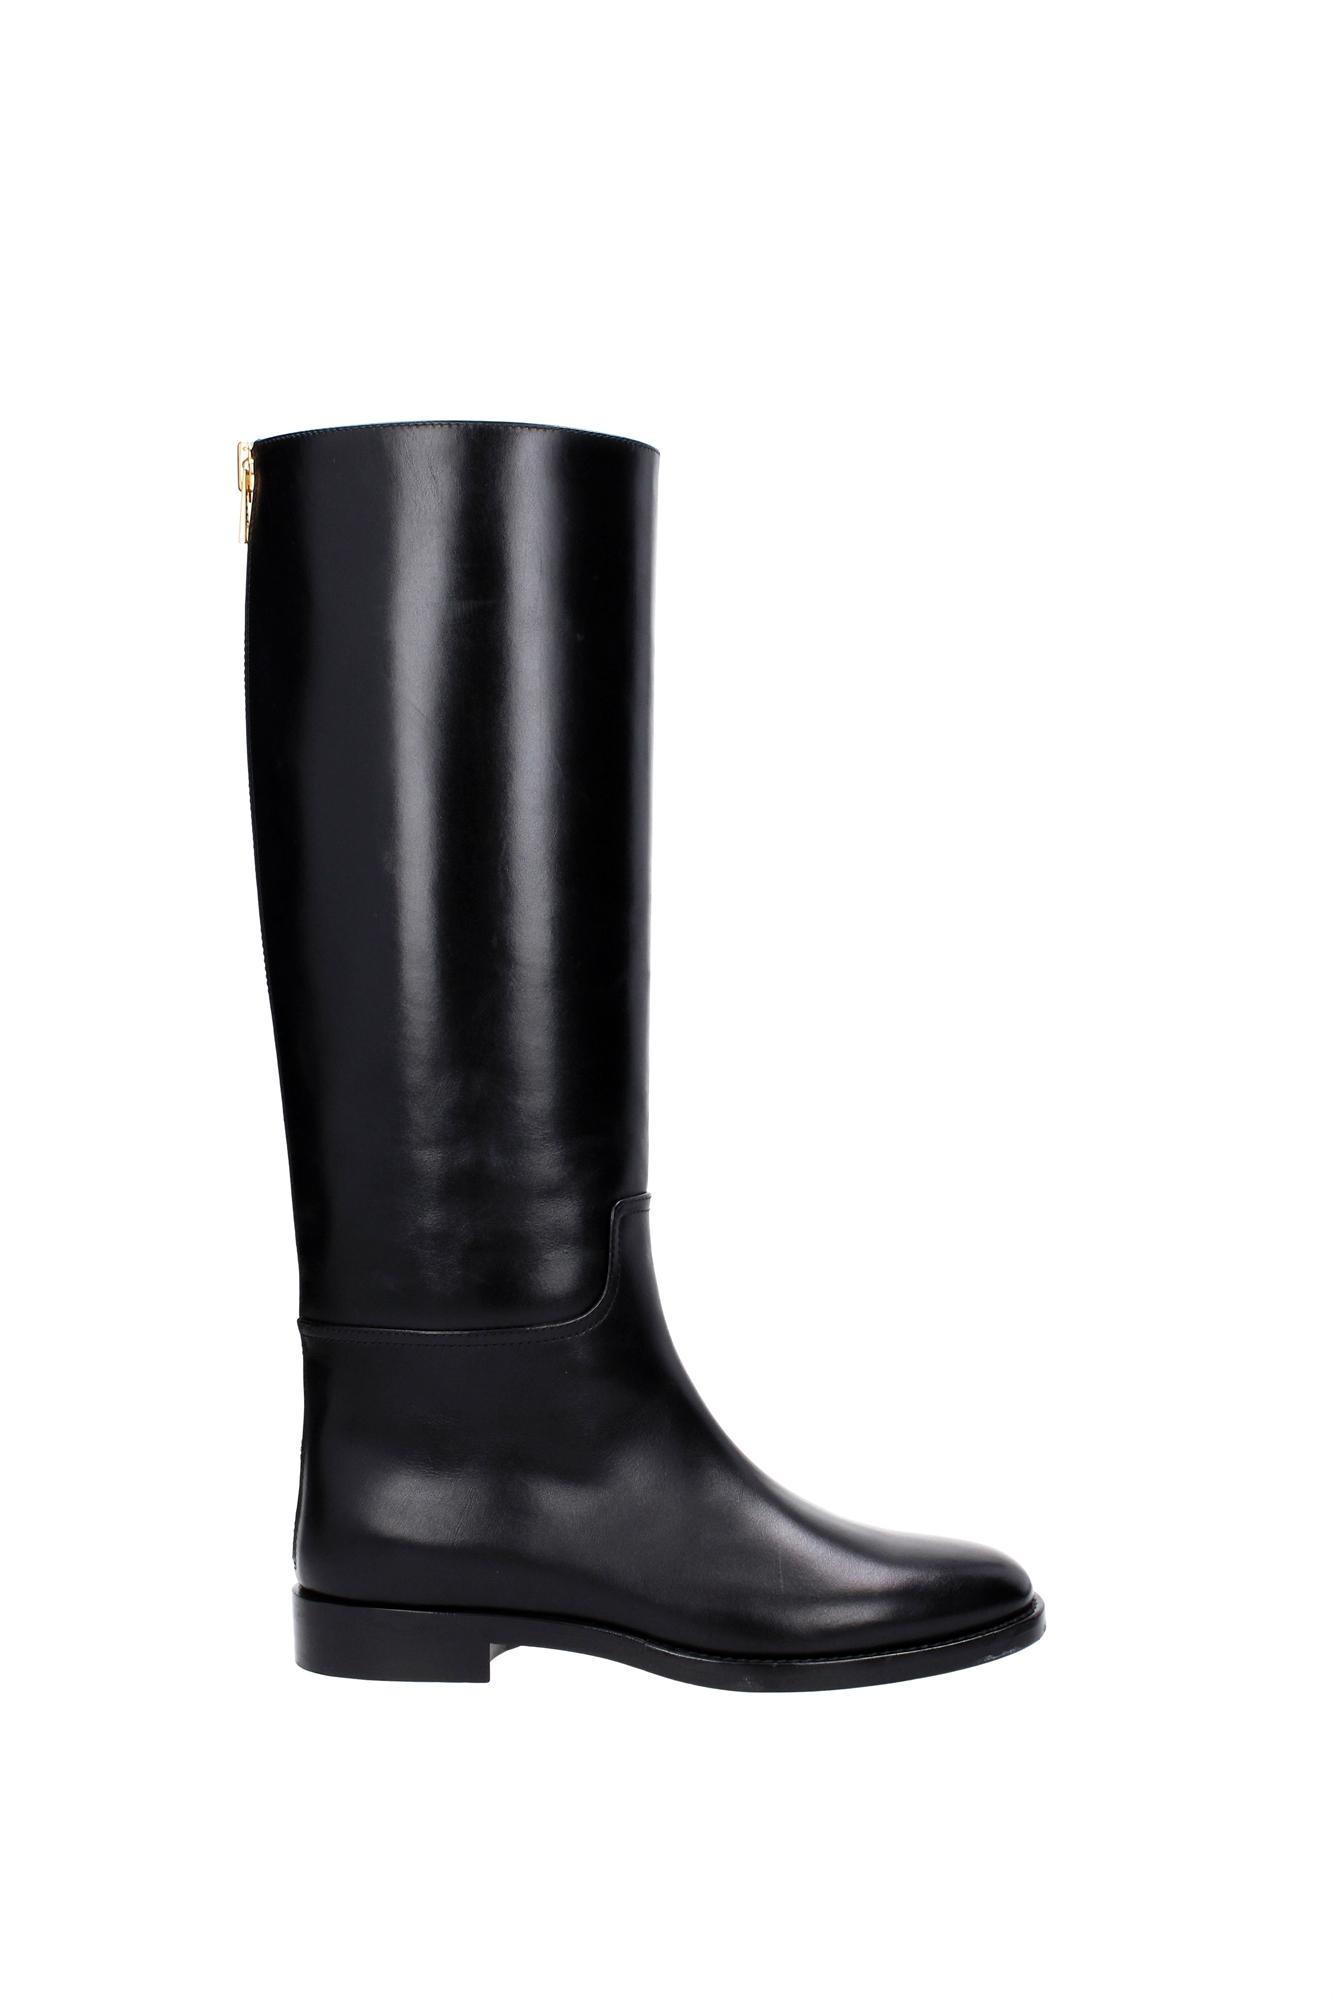 boots tom ford leather black 214w1131tnolblk ebay